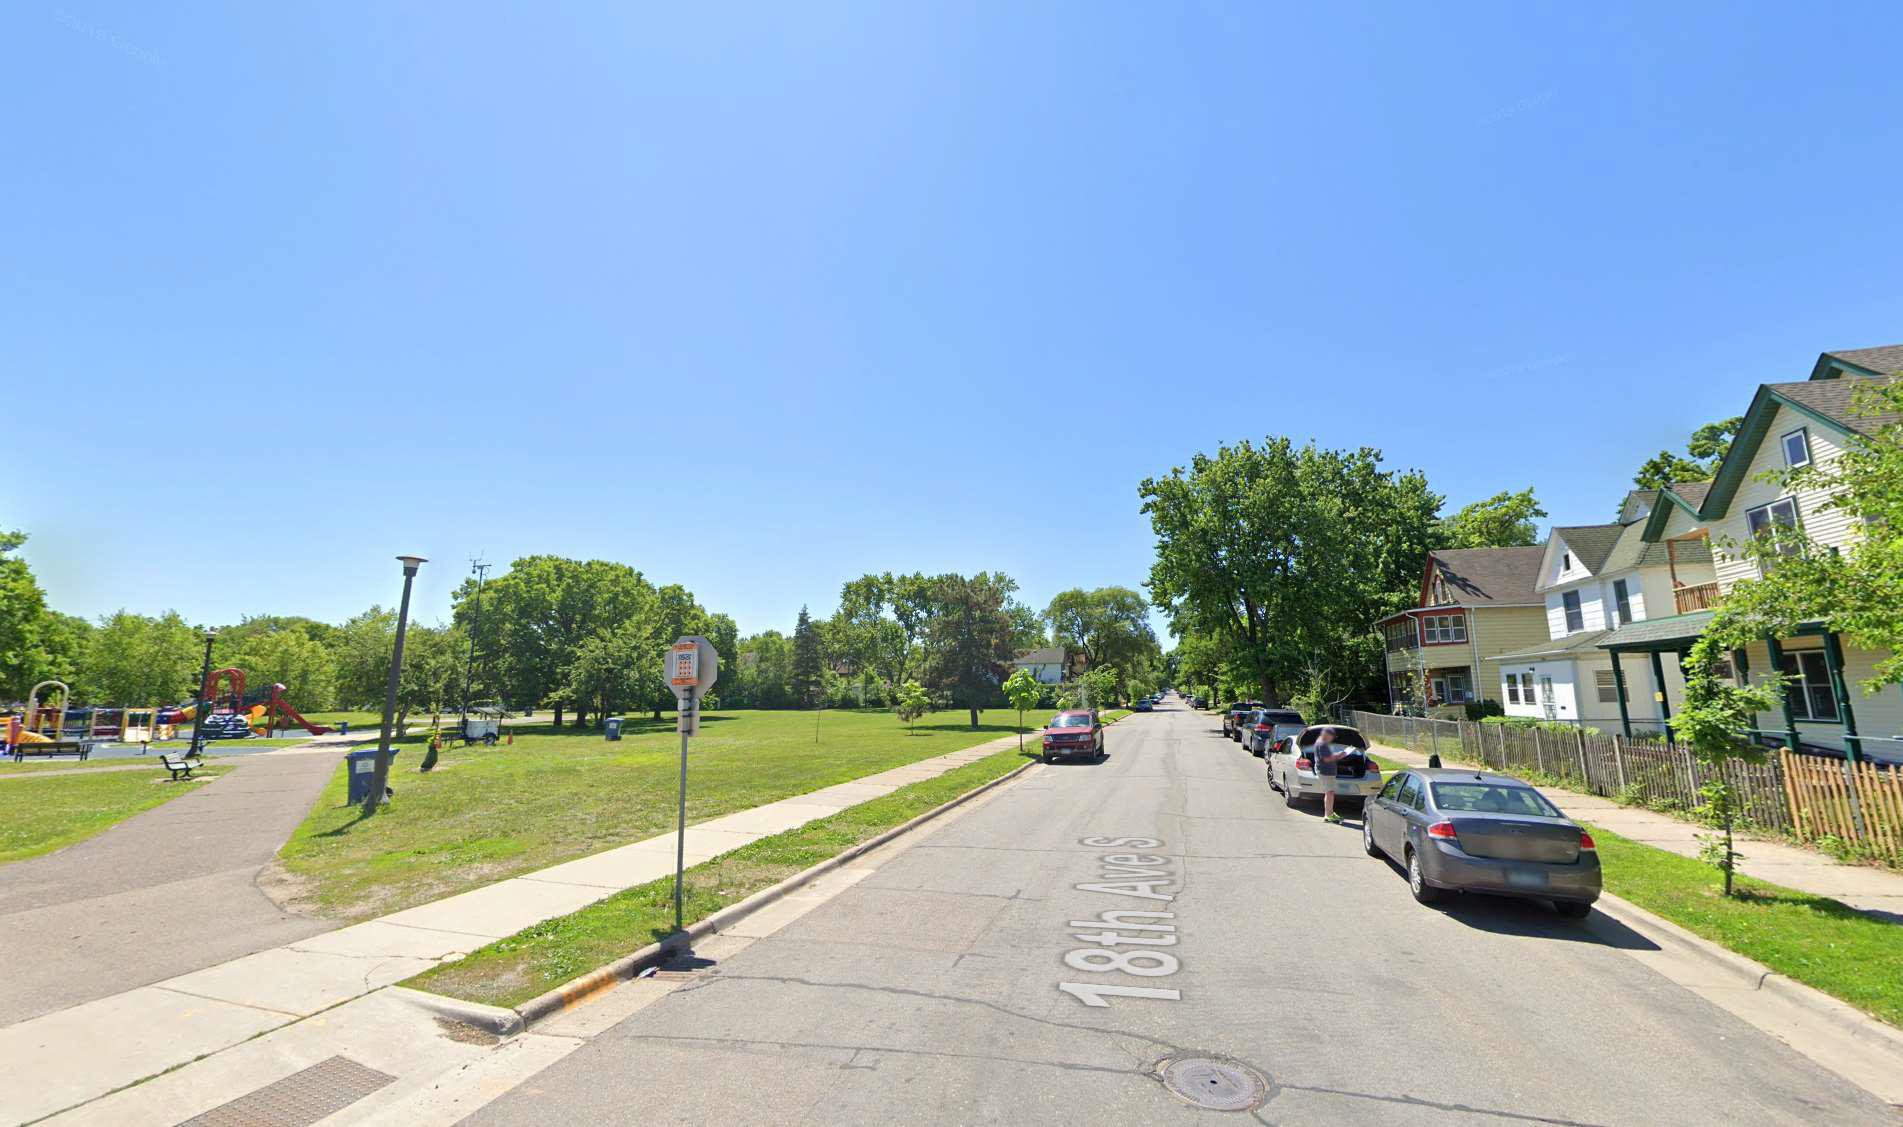 street view of very low opportunity neighborhood in Minneapolis, MN